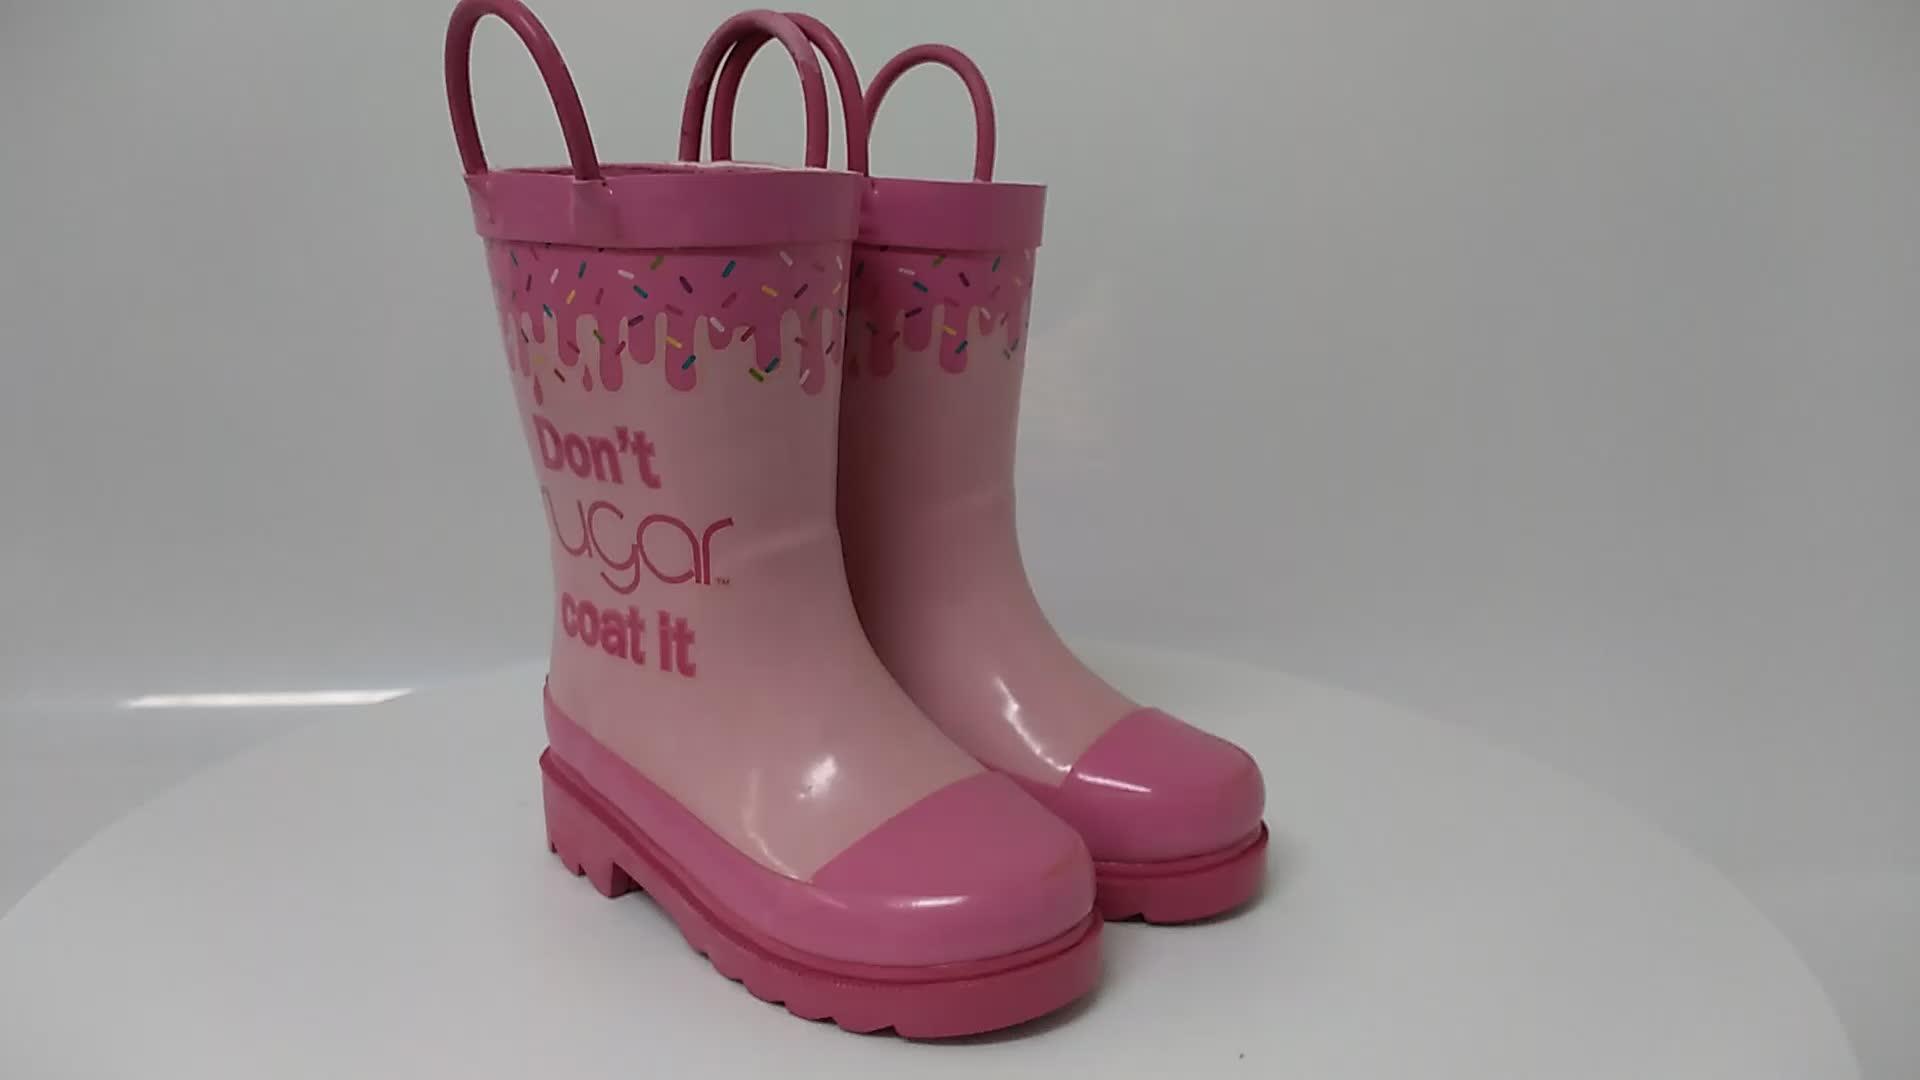 Western Cheif KIDS shark rain boots wellies water size 8 EUC girls or boys Waterproof shoes rain boots wholesale